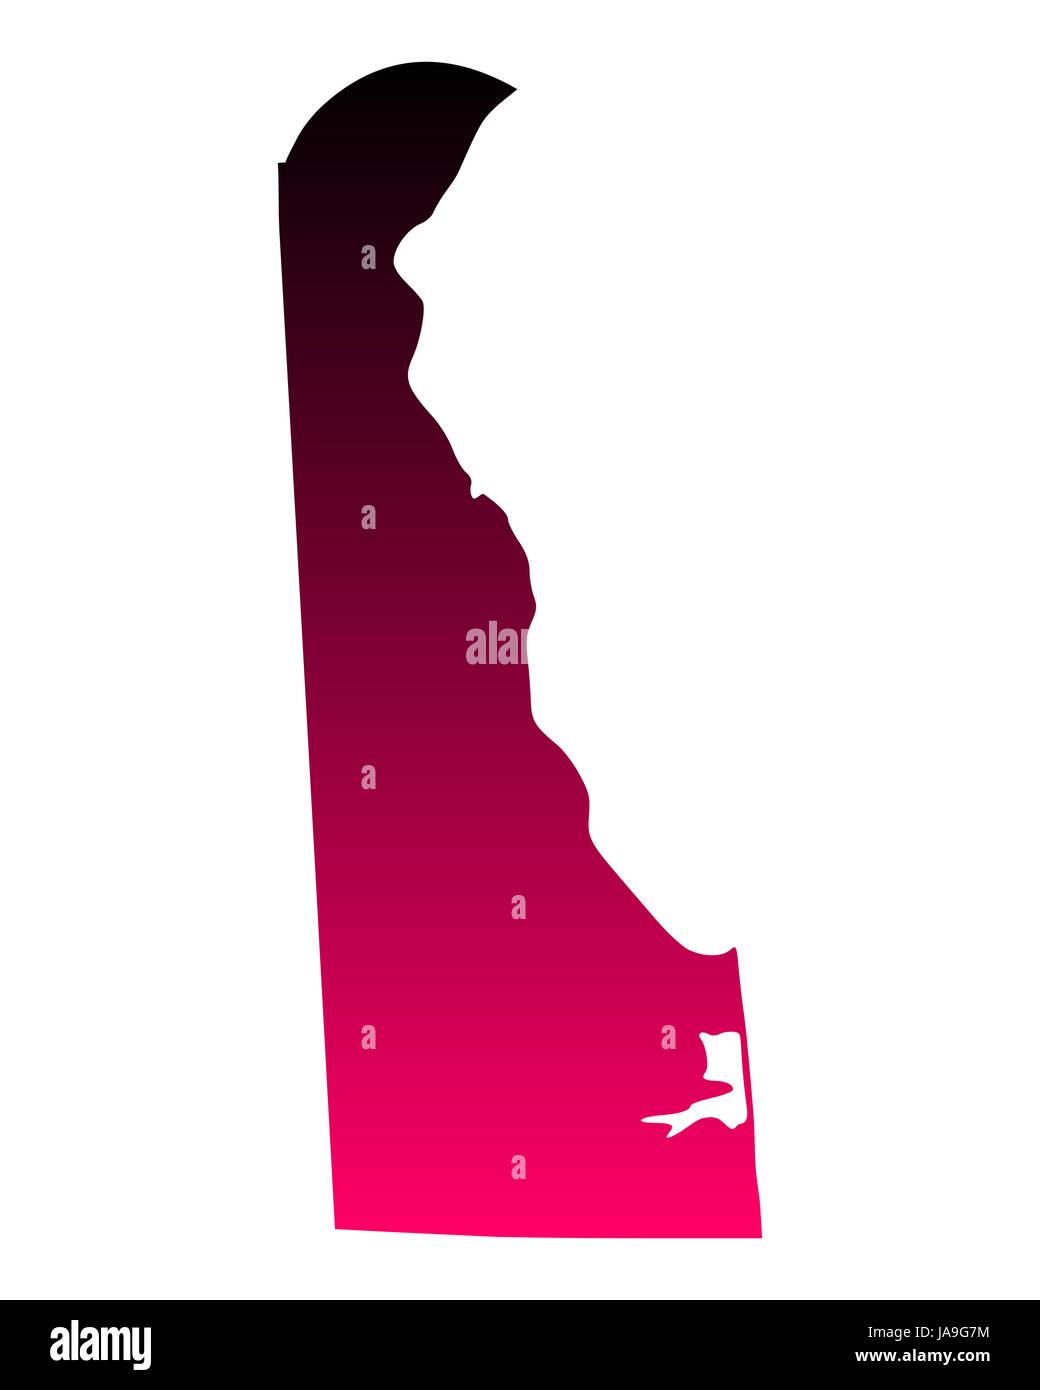 Karte von Delaware - Stock Image